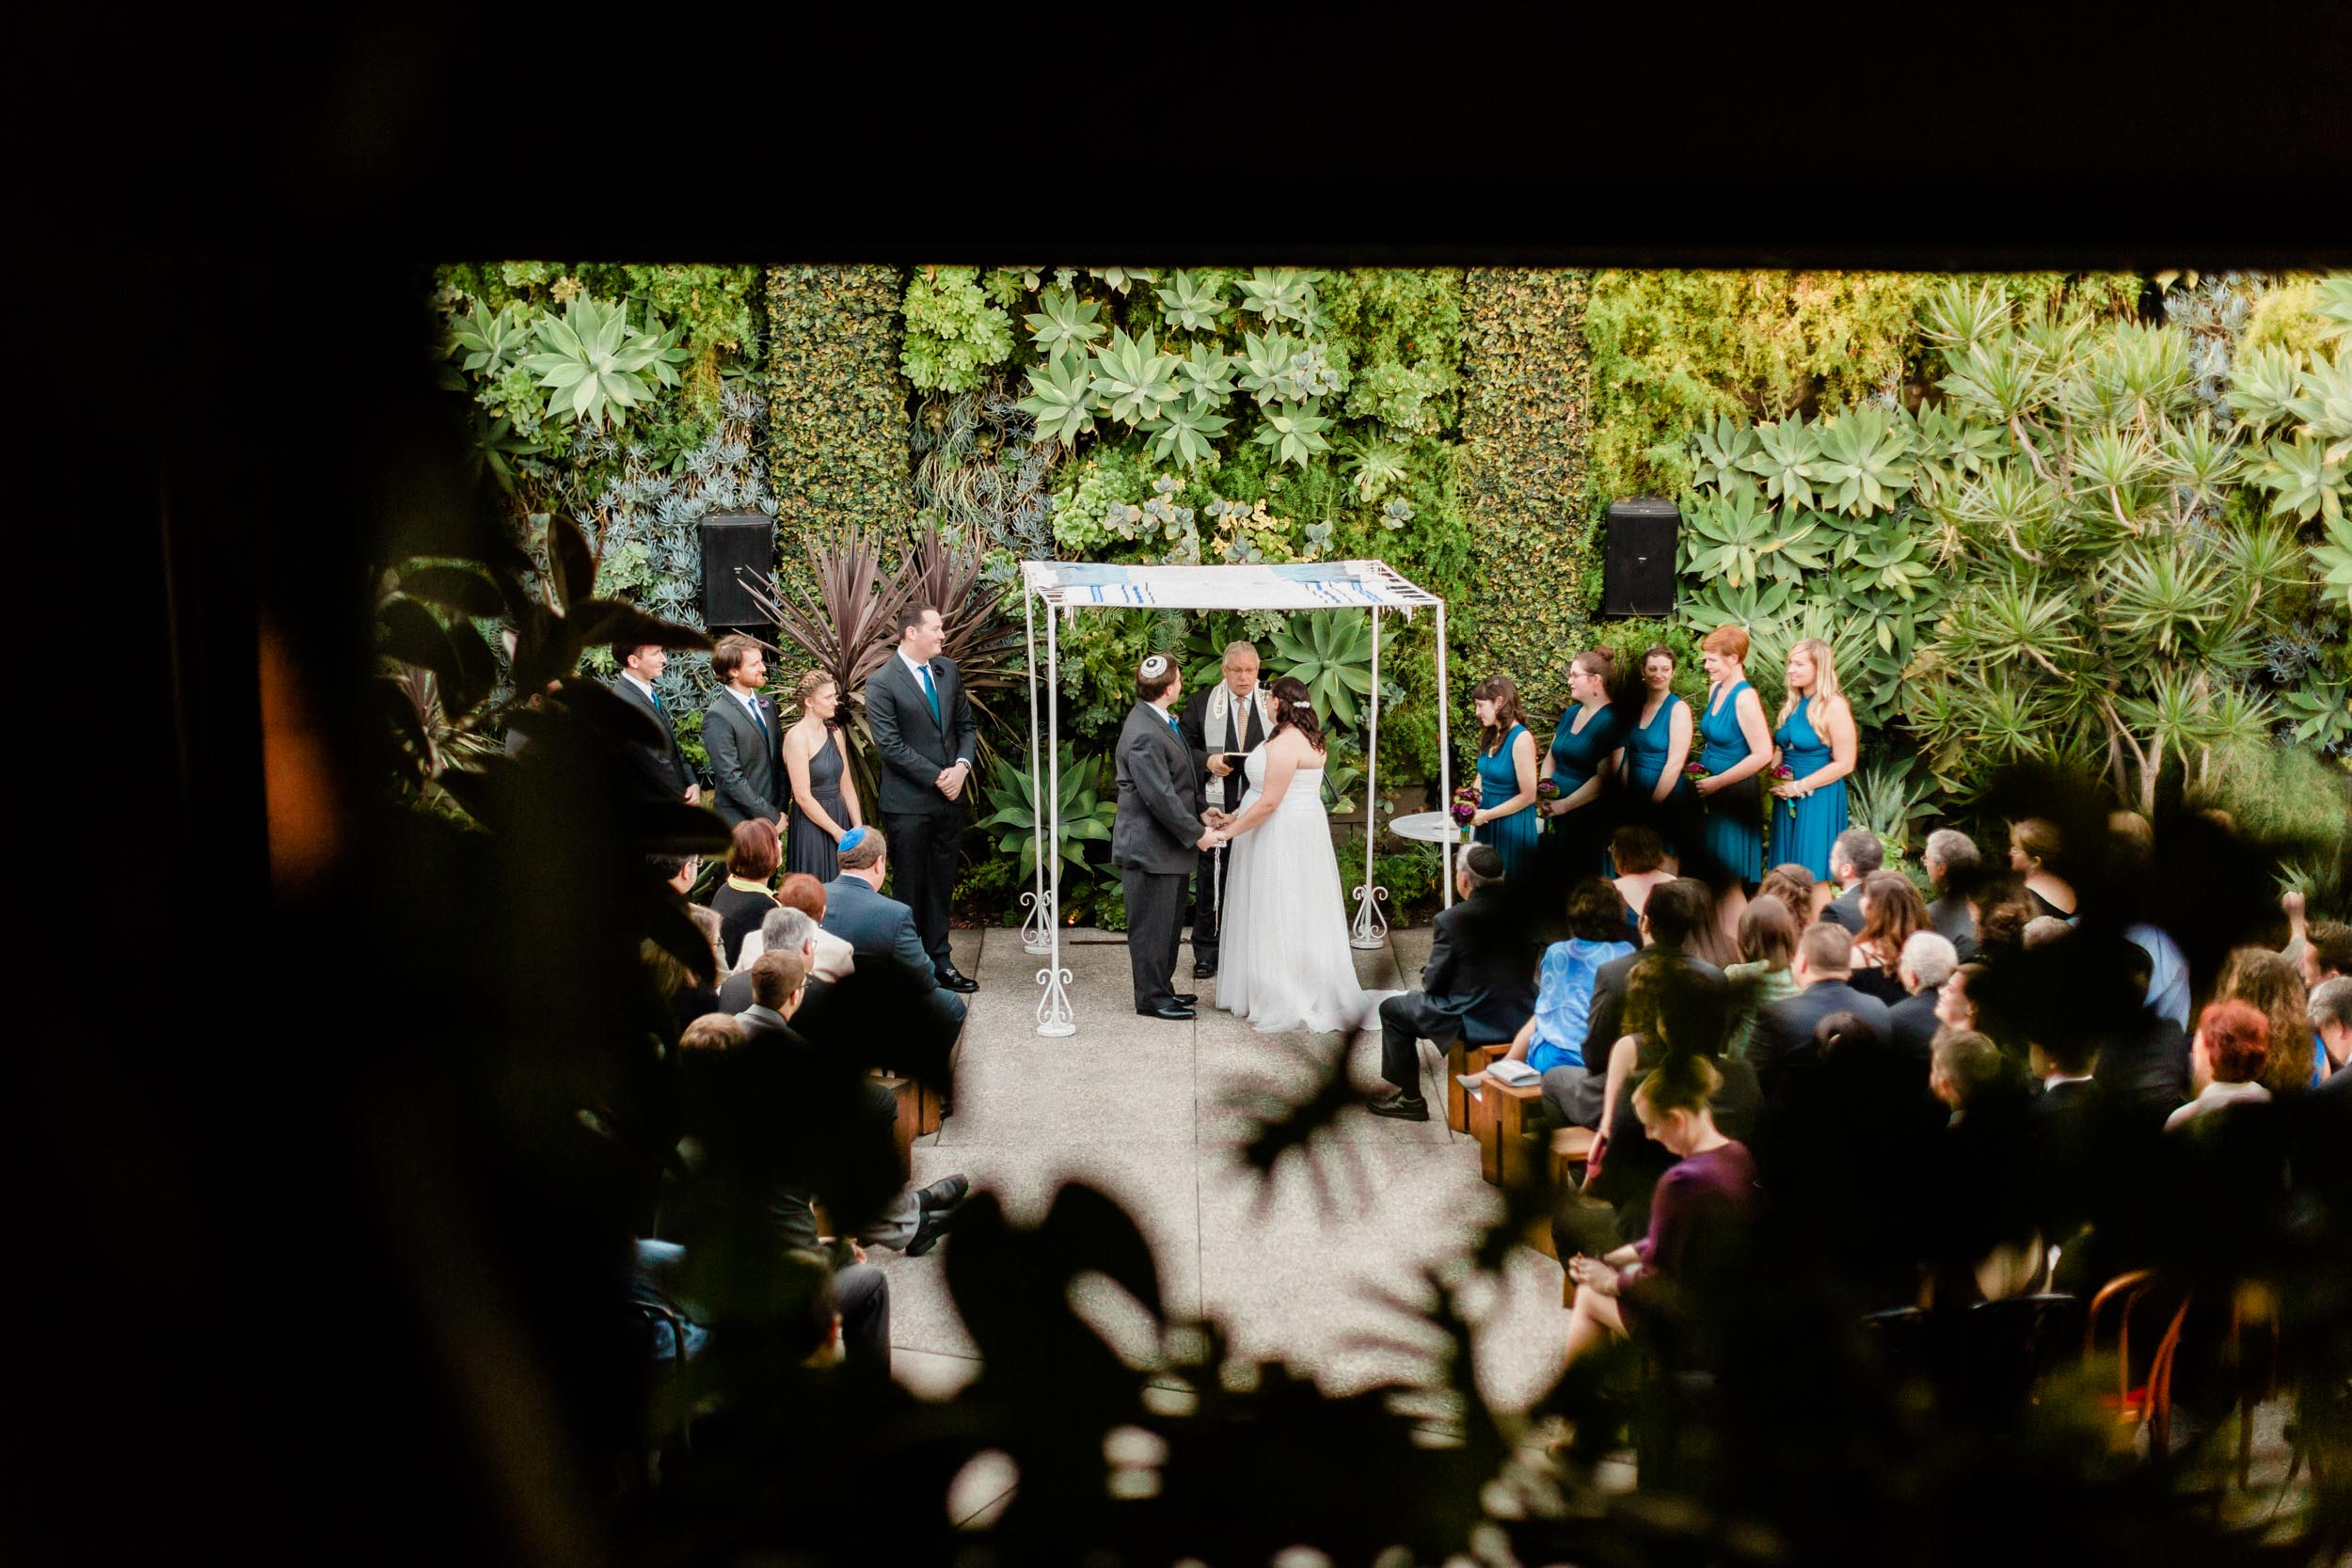 BKM-Photography-Smog-Shoppe-Culver-City-Wedding-Photographer-Culver-Hotel-0046.jpg